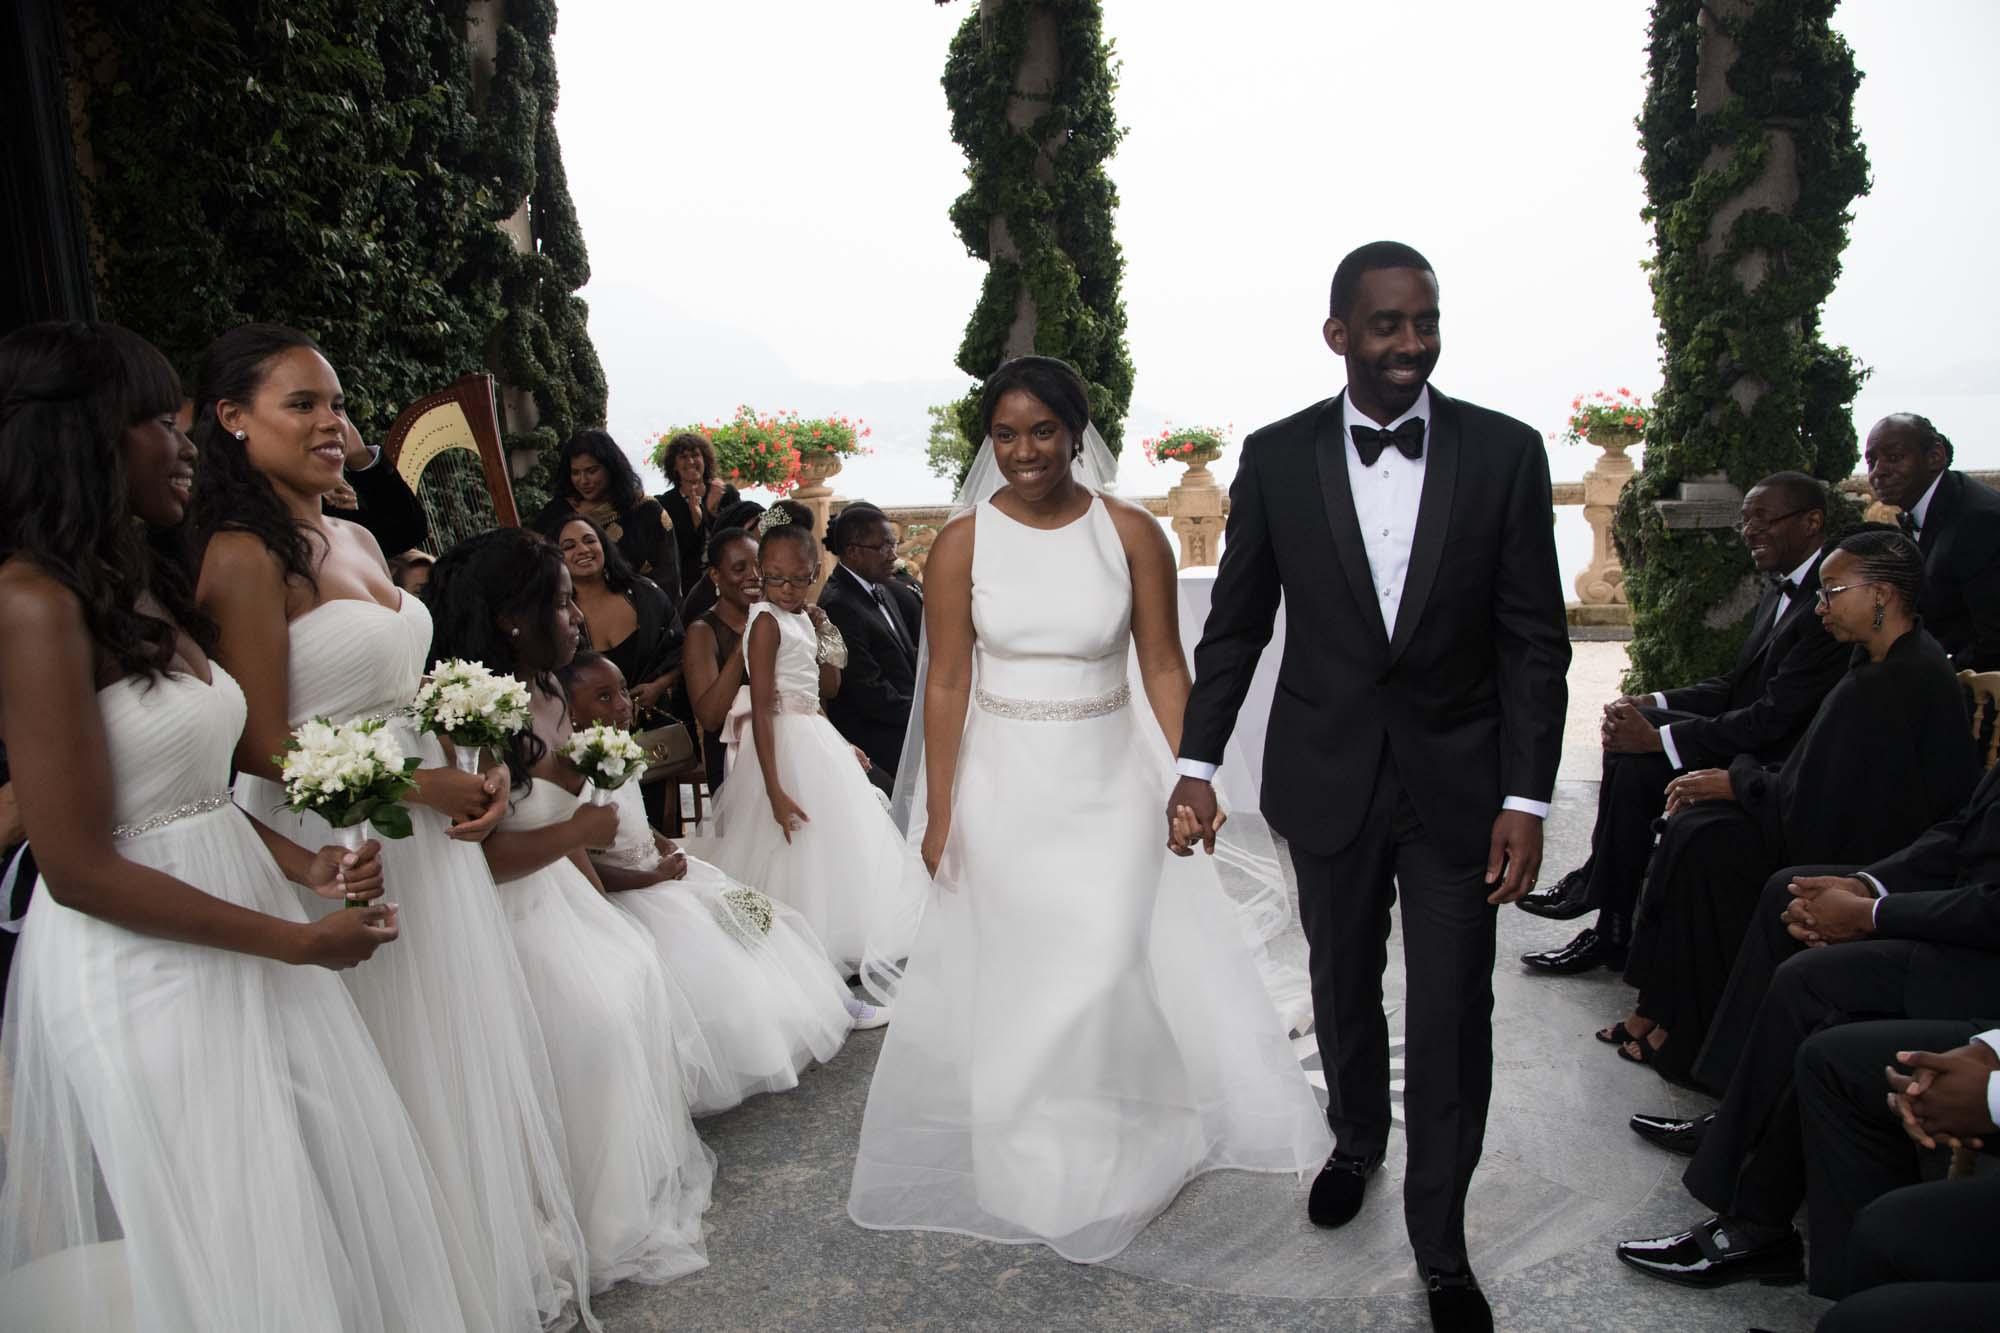 Lake-Como-Italy-Wedding-Jamie-Levine-Photography-18.jpg